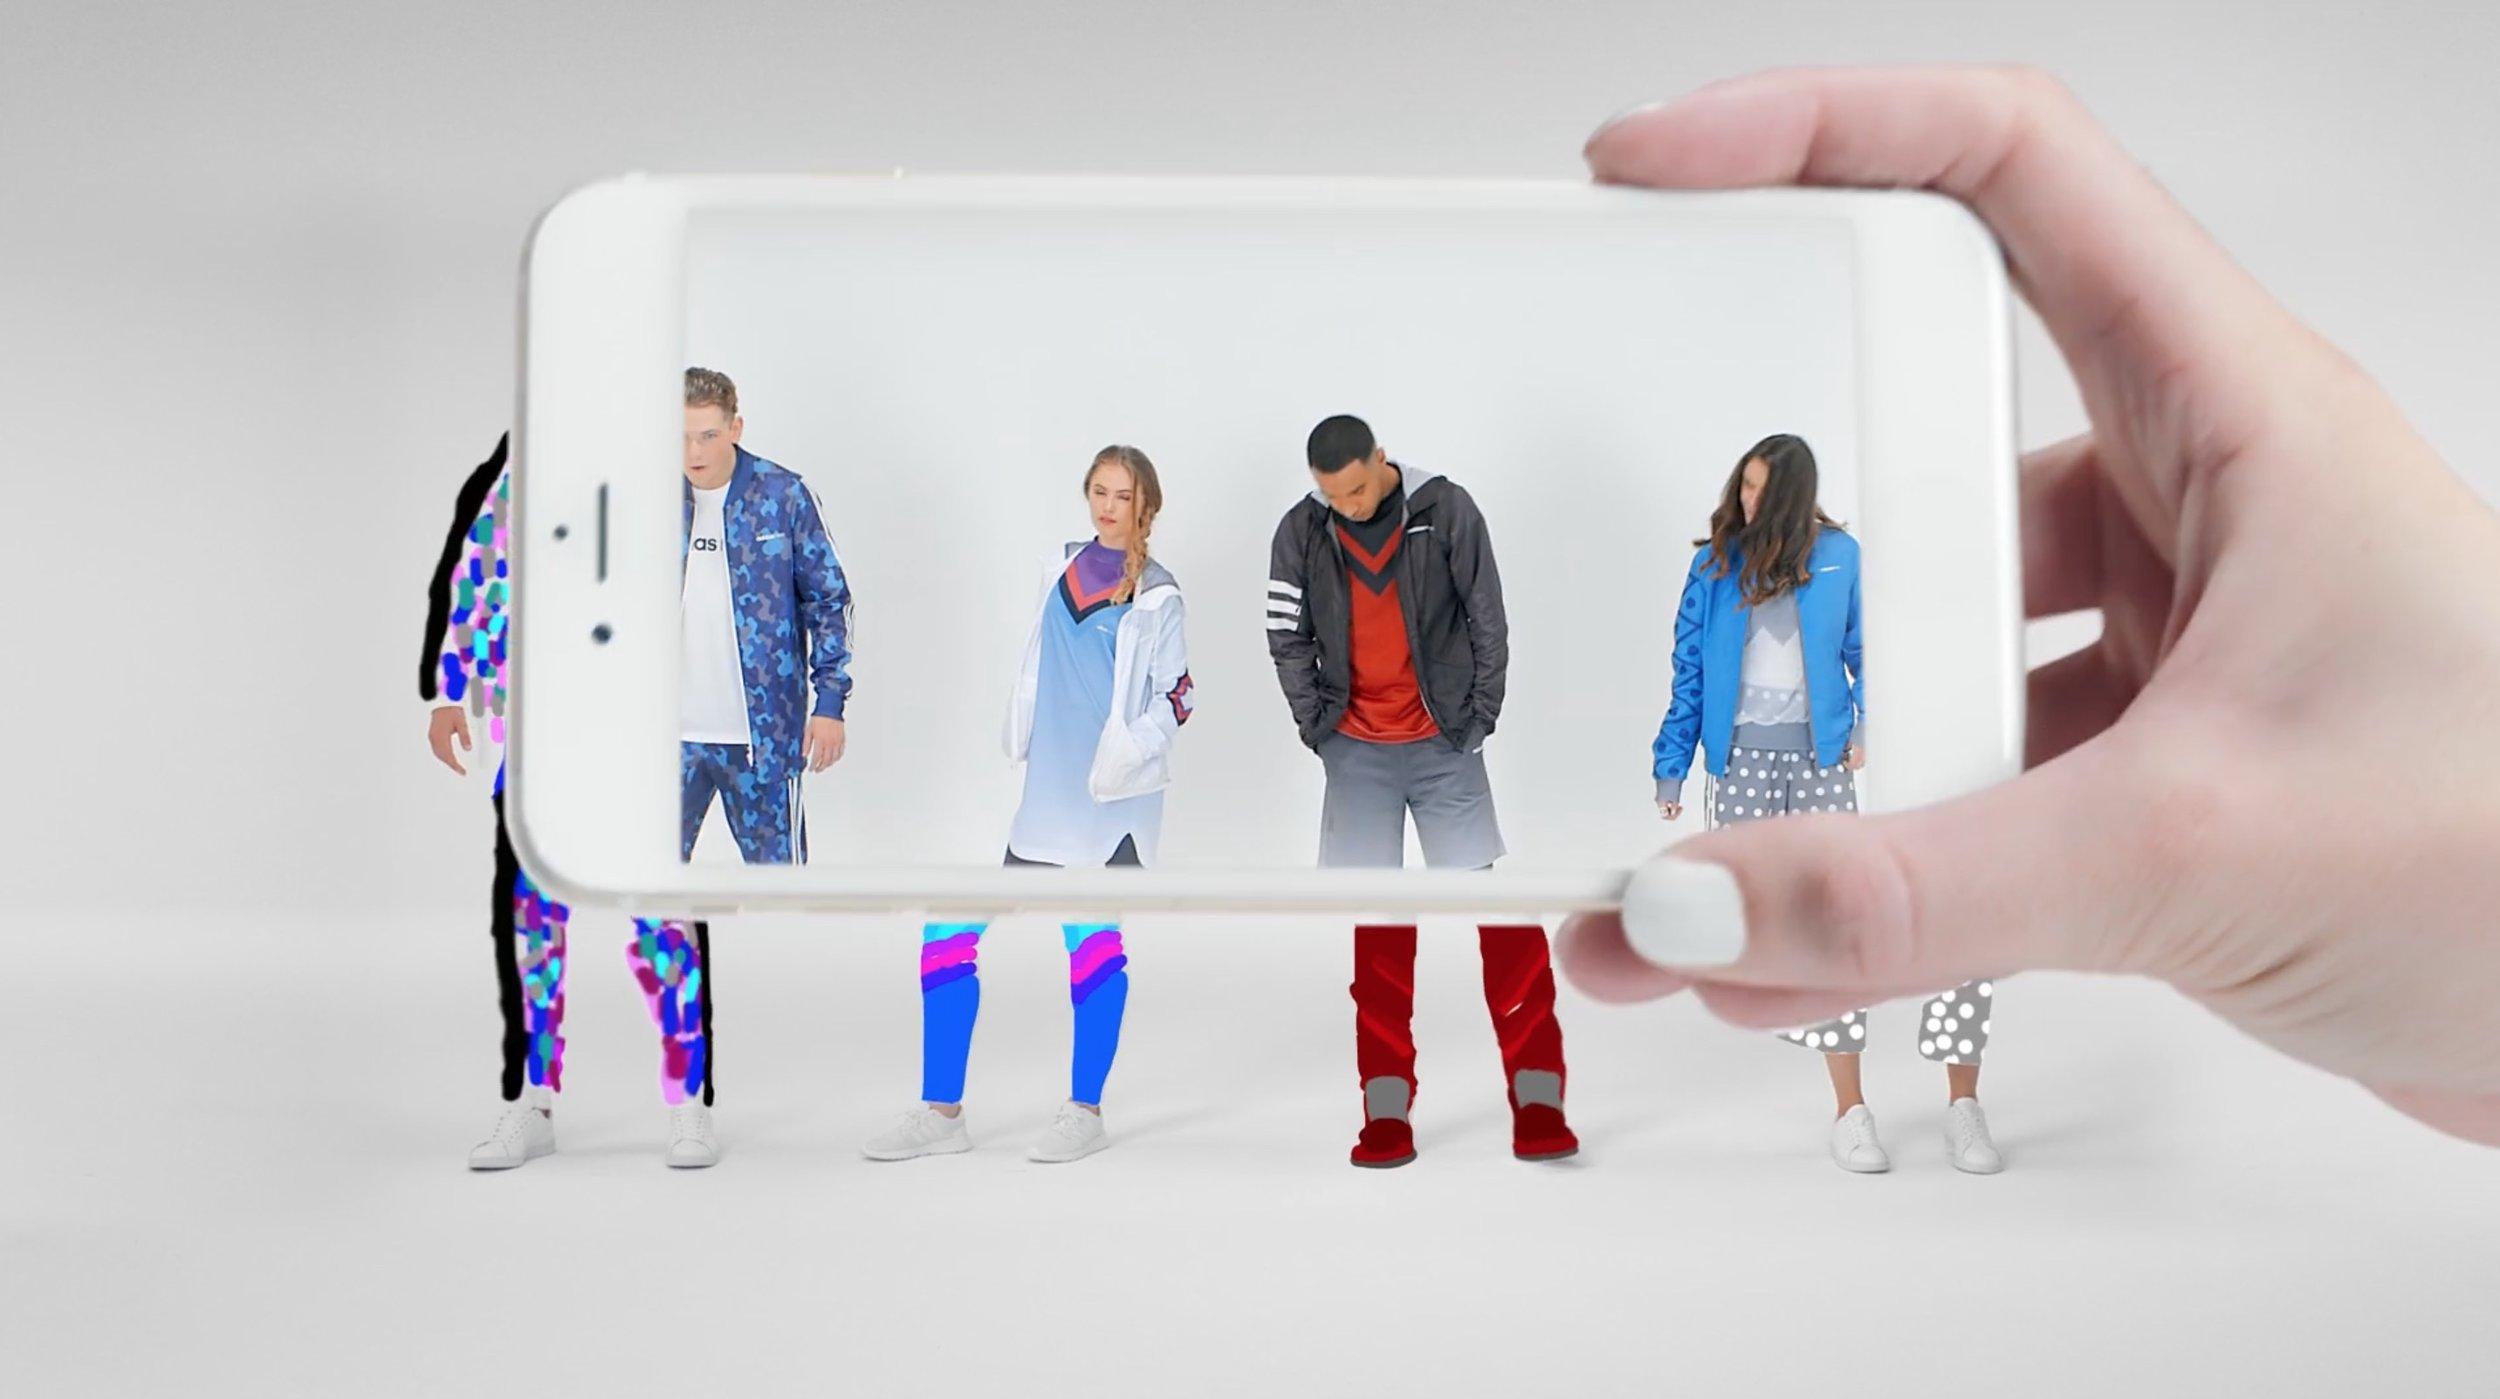 Adidas / Director Eshan - Creative Researcher Fran Odim-Loughlin